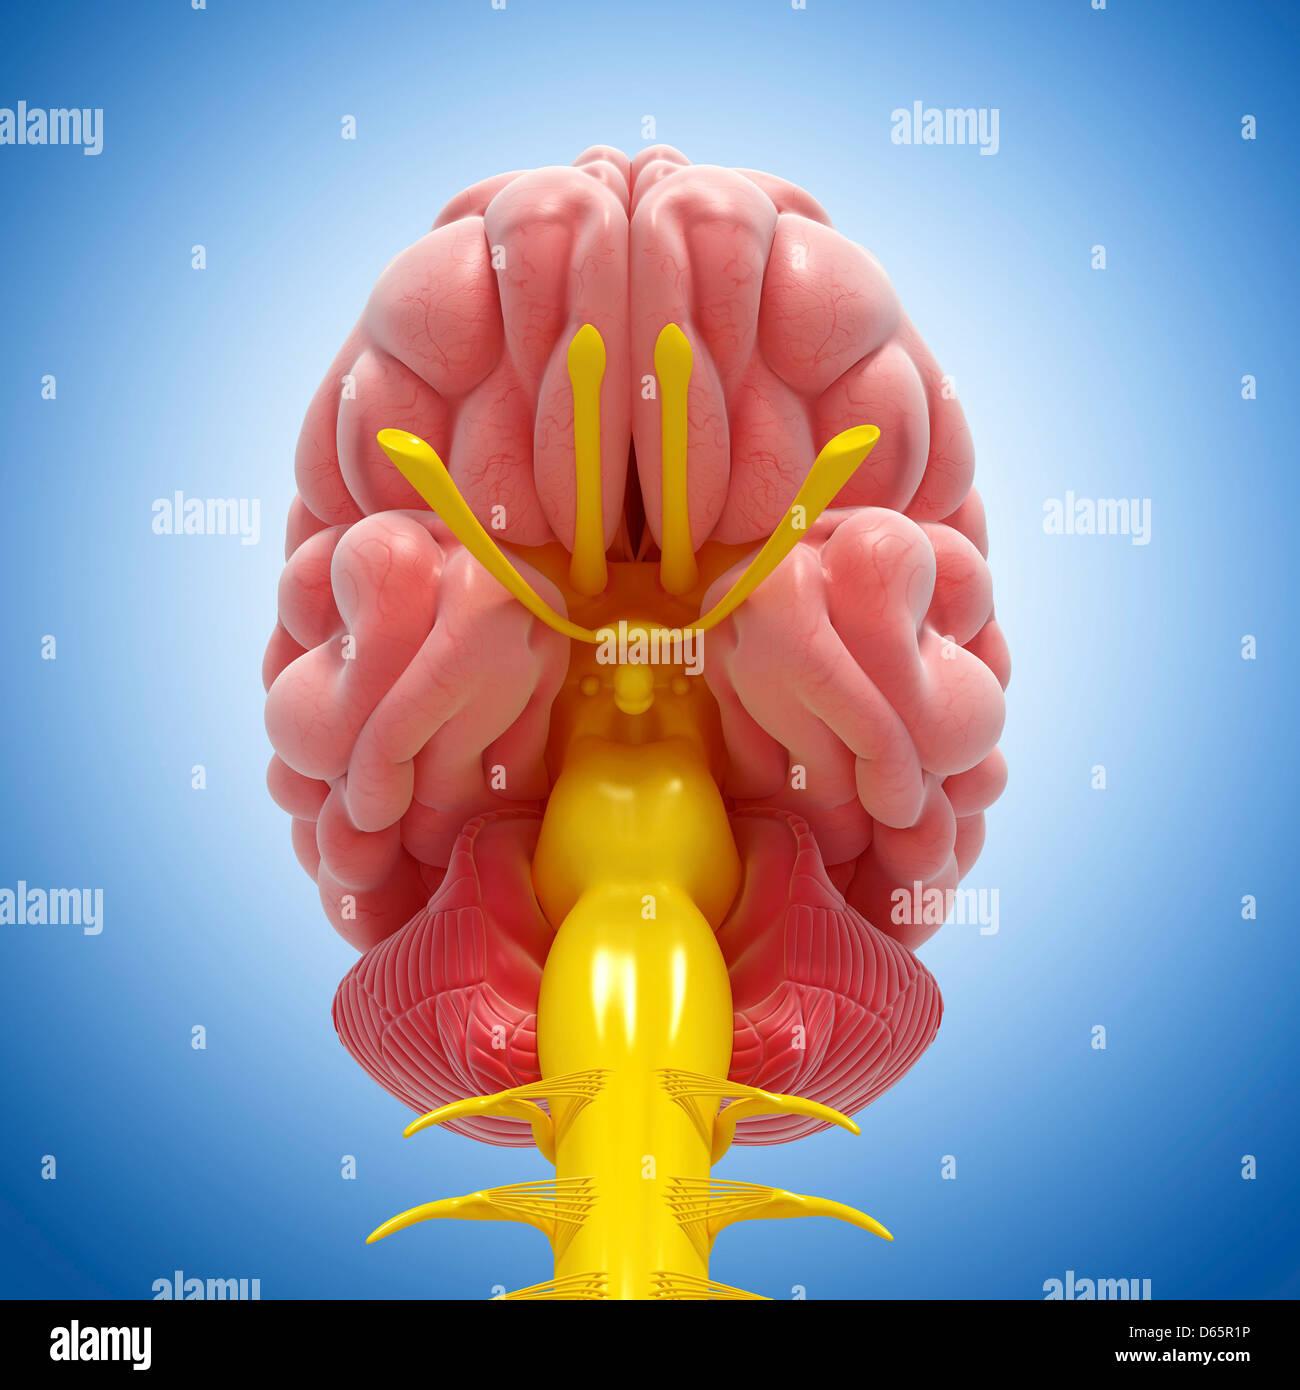 Brain anatomy, artwork - Stock Image